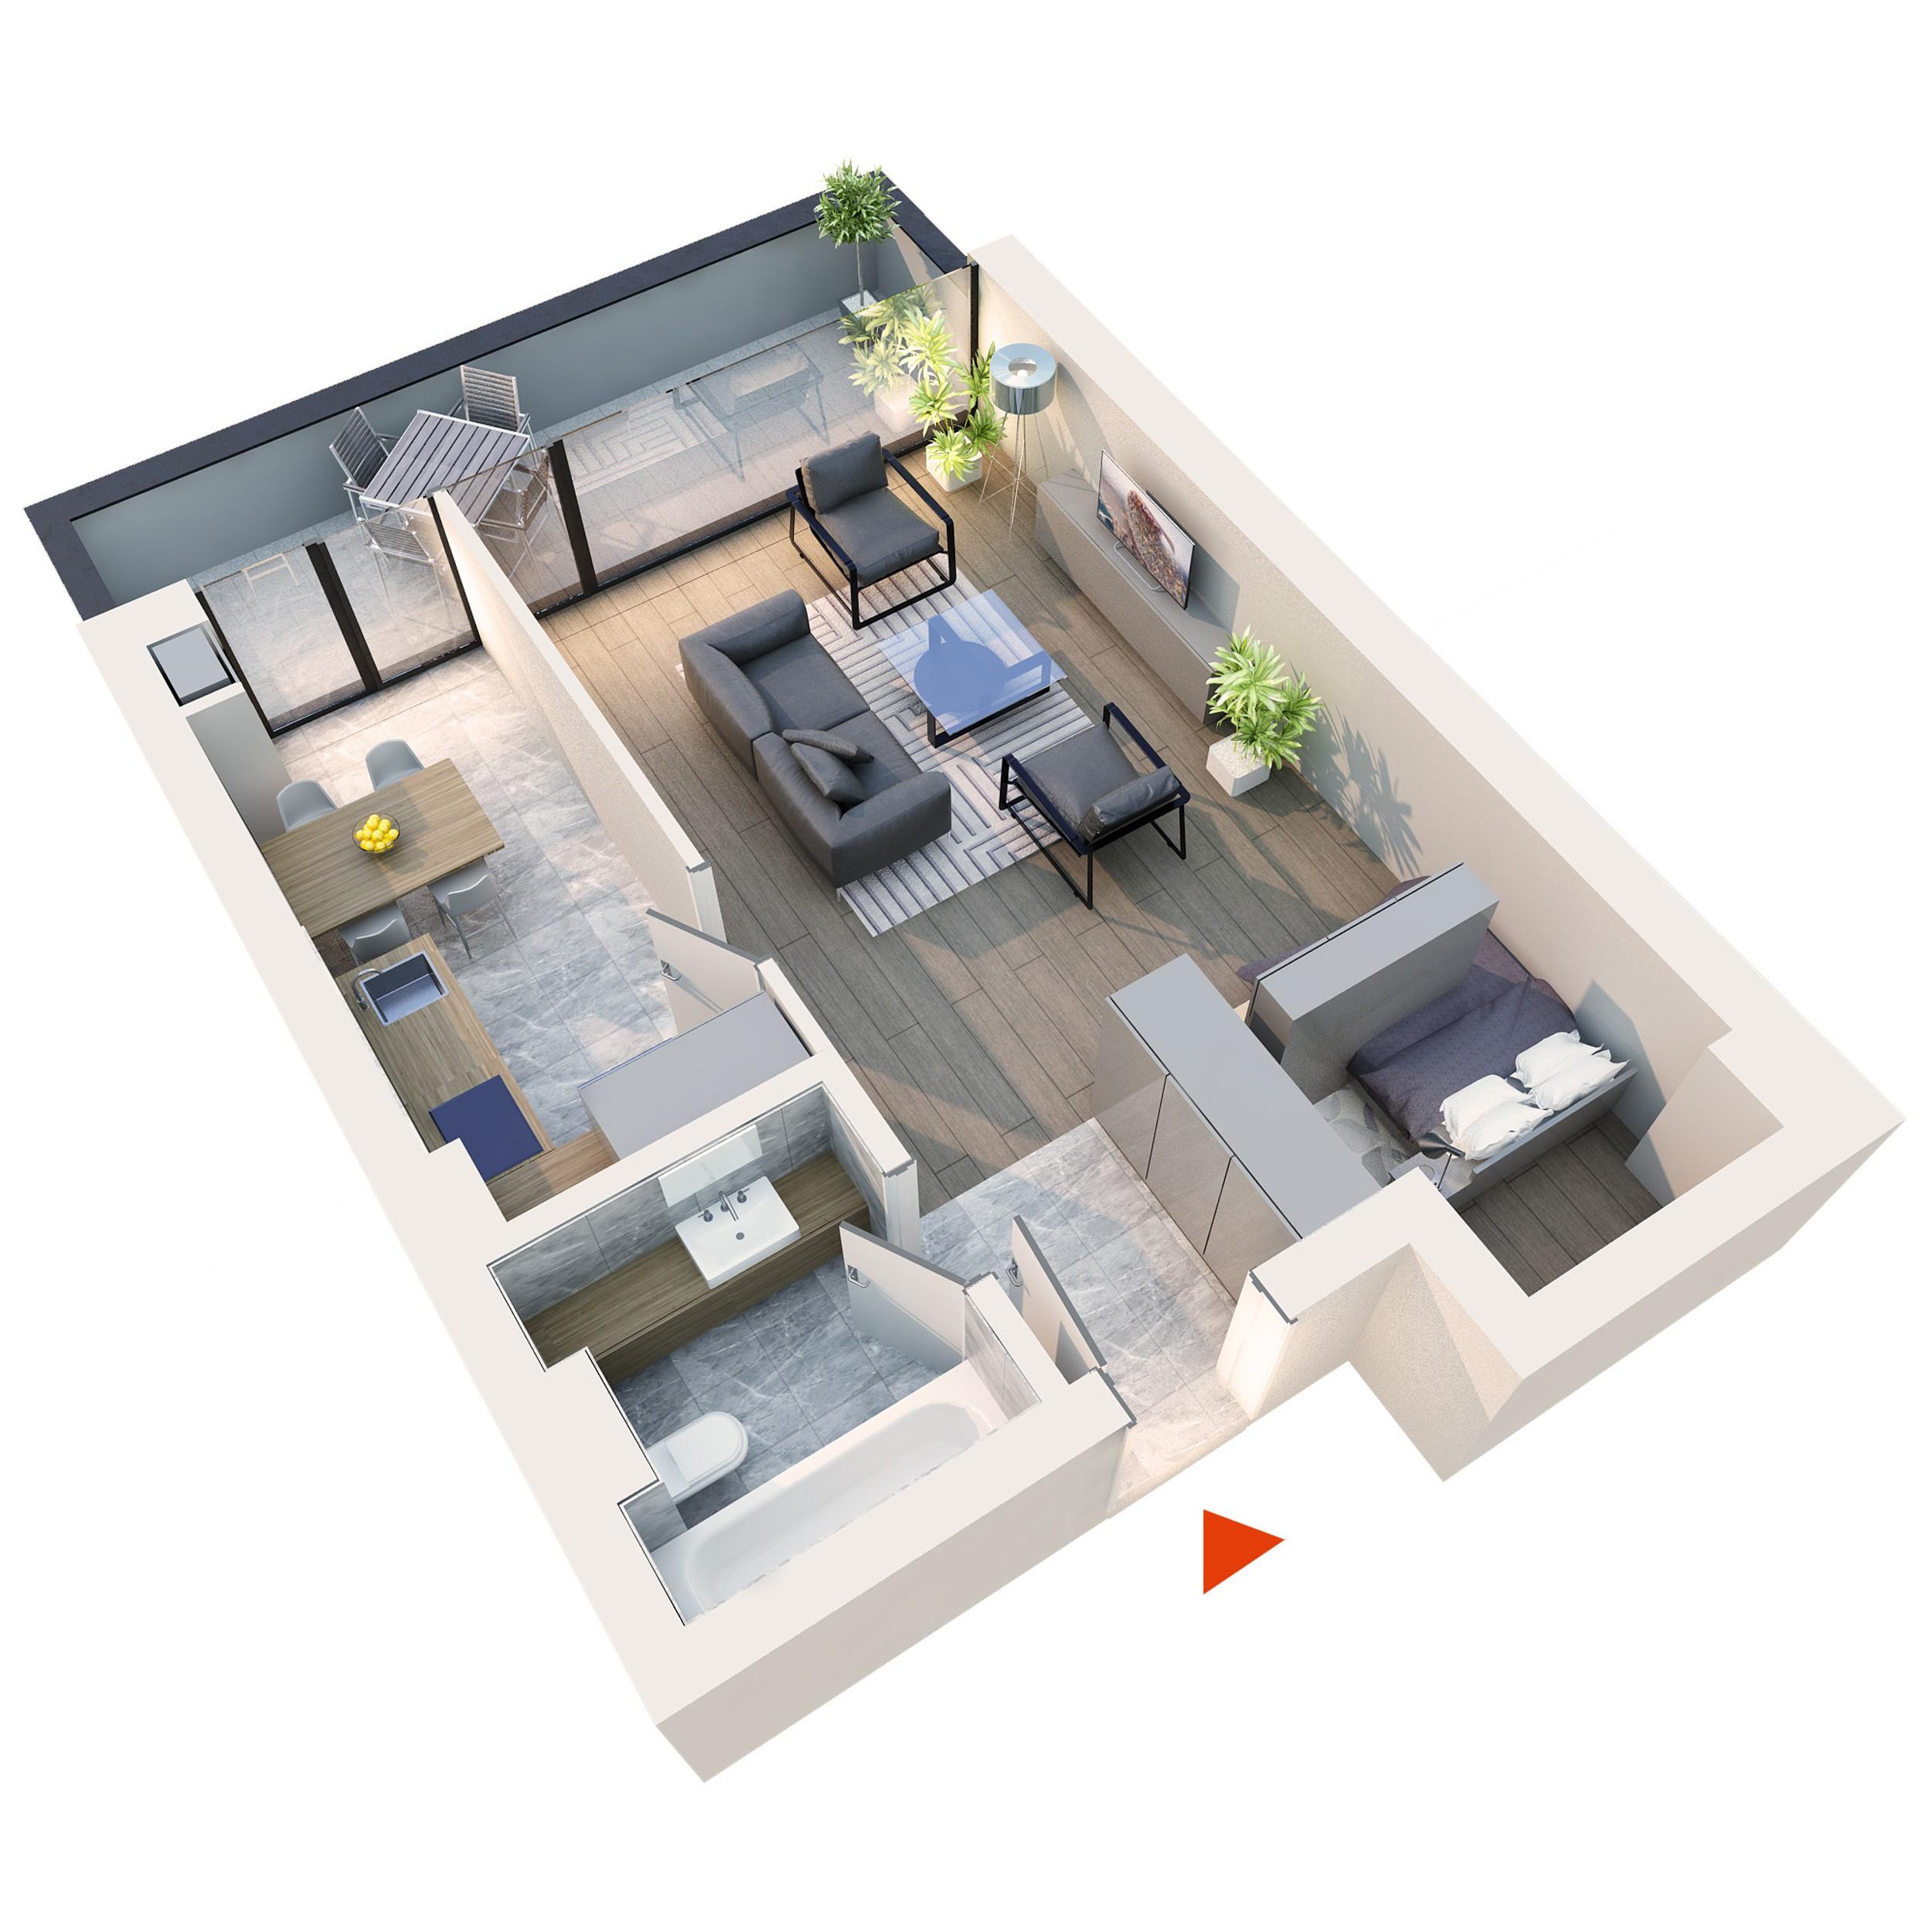 Apartament Studio tip 1F2 | Balcon | Etaj 6 | Corp C7 C8 | Faza 2